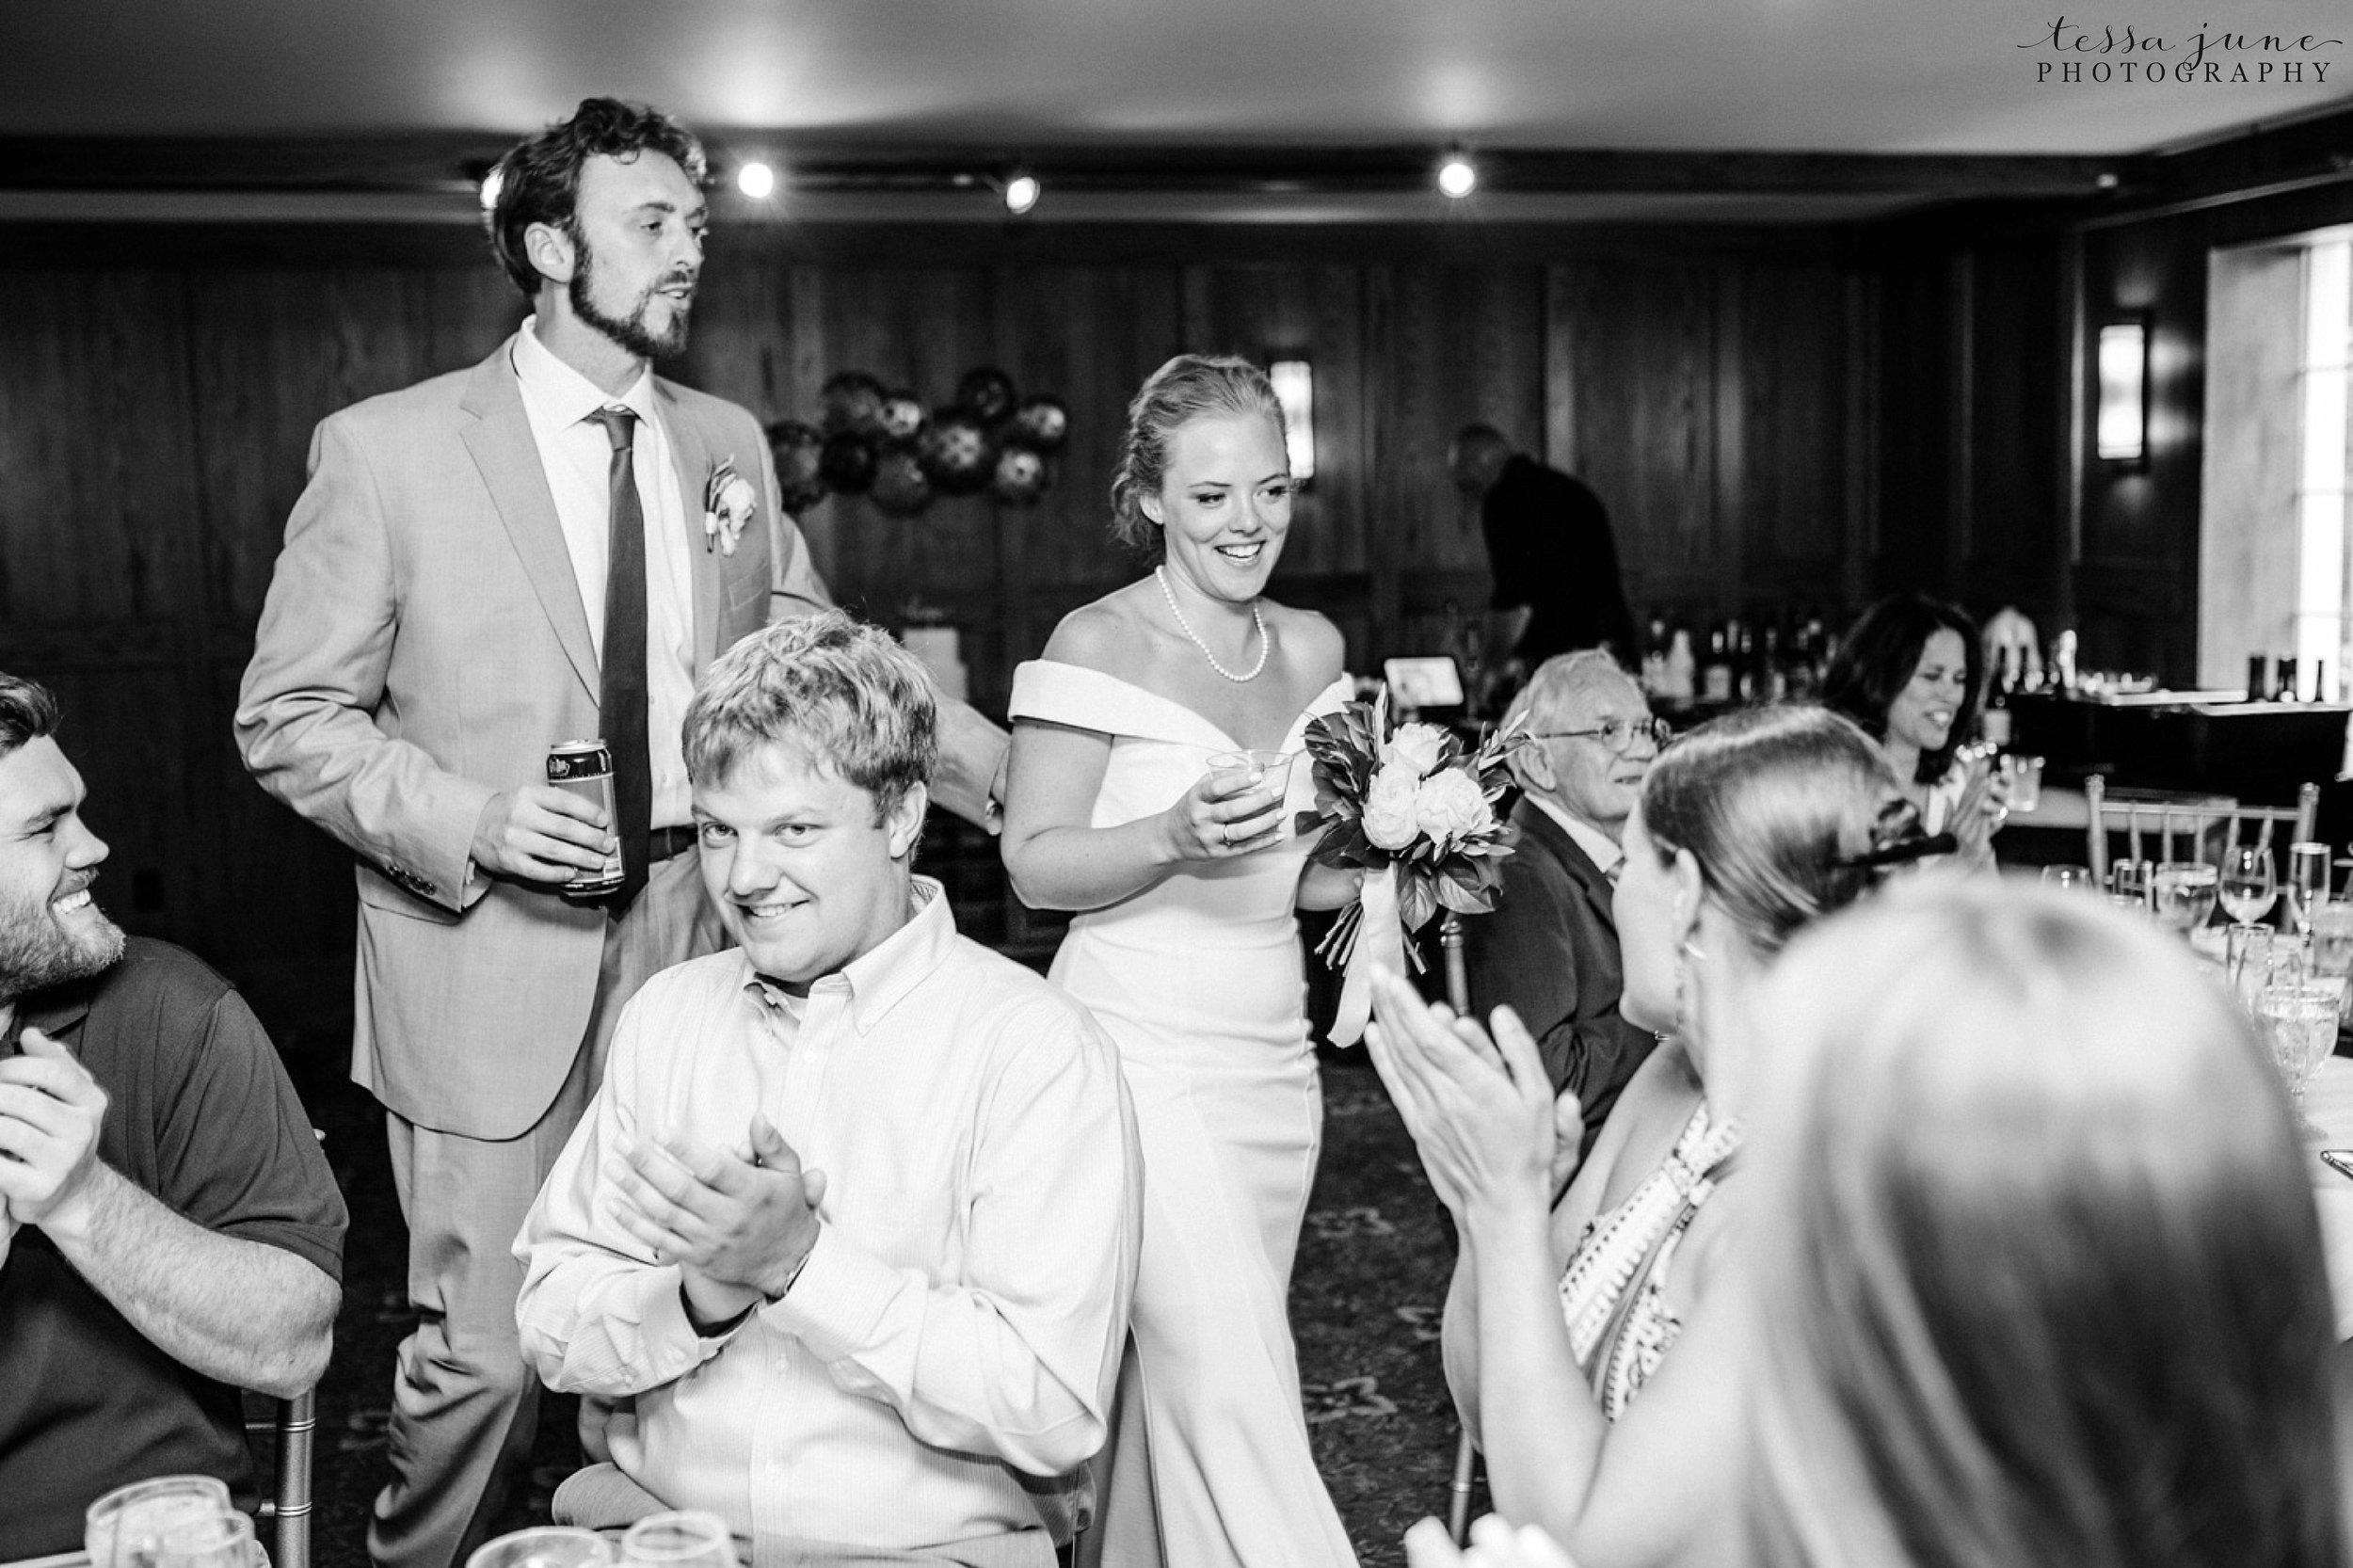 grandview-lodge-intimate-wedding-nisswa-minnesota_0093.jpg